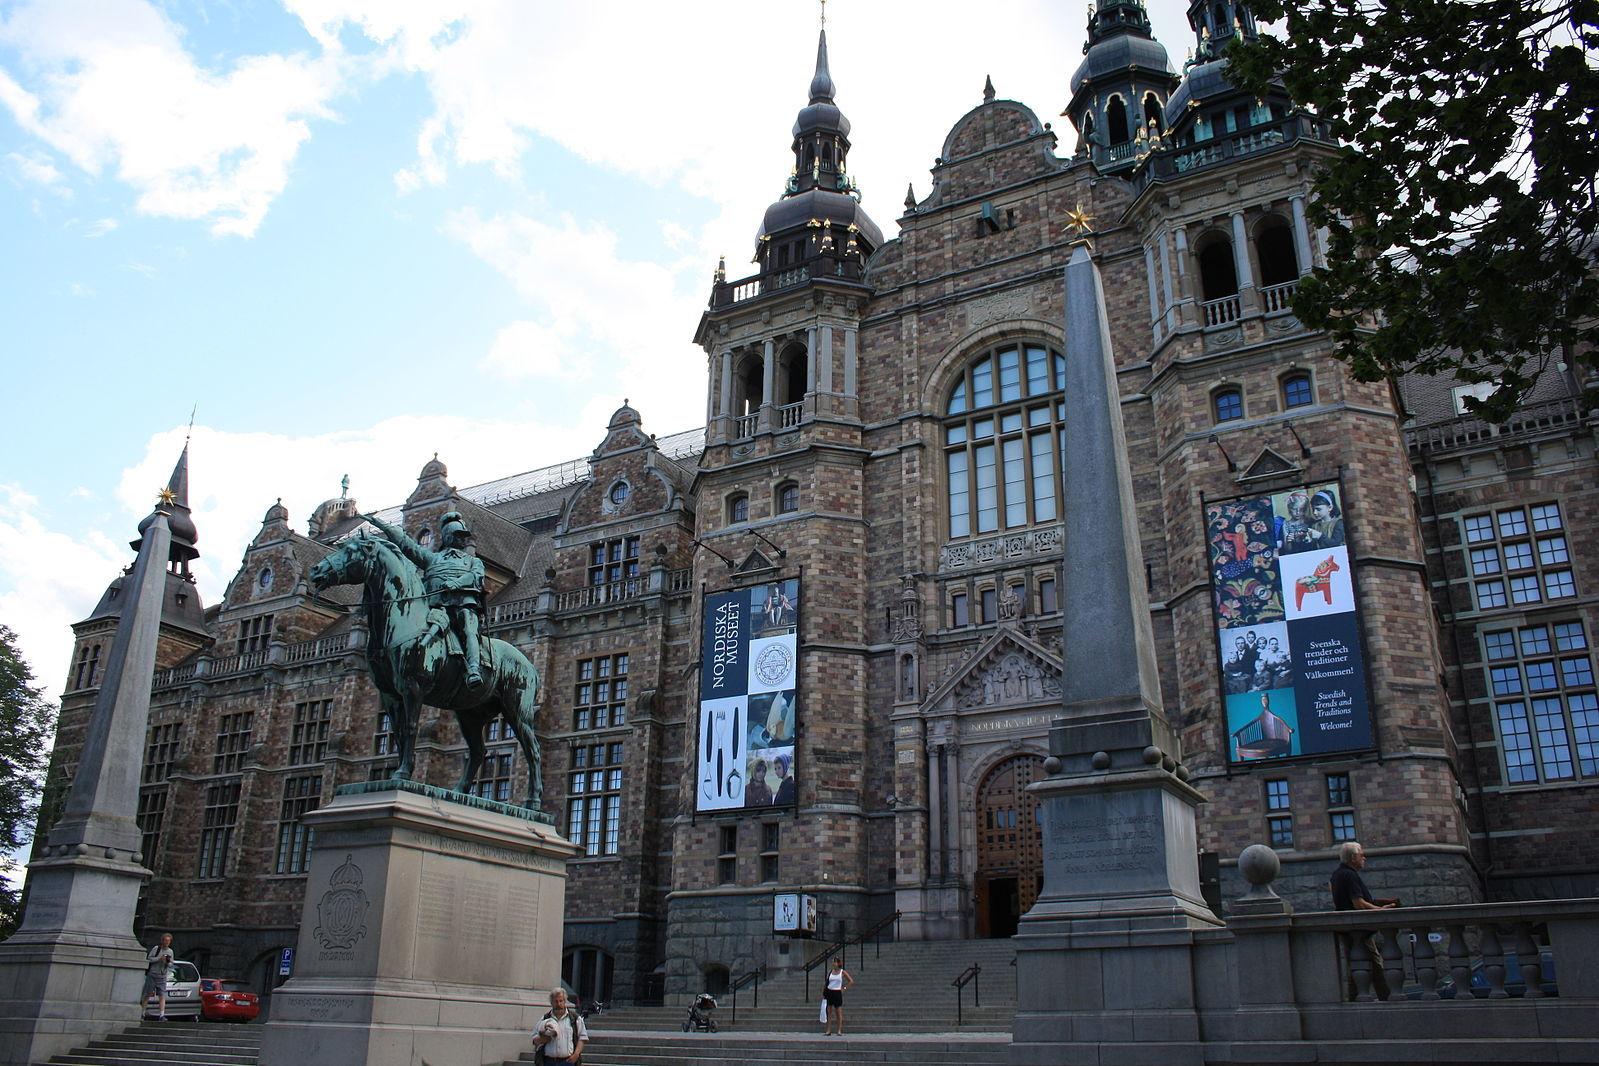 The Nordic Museum (Nordiska Museet)